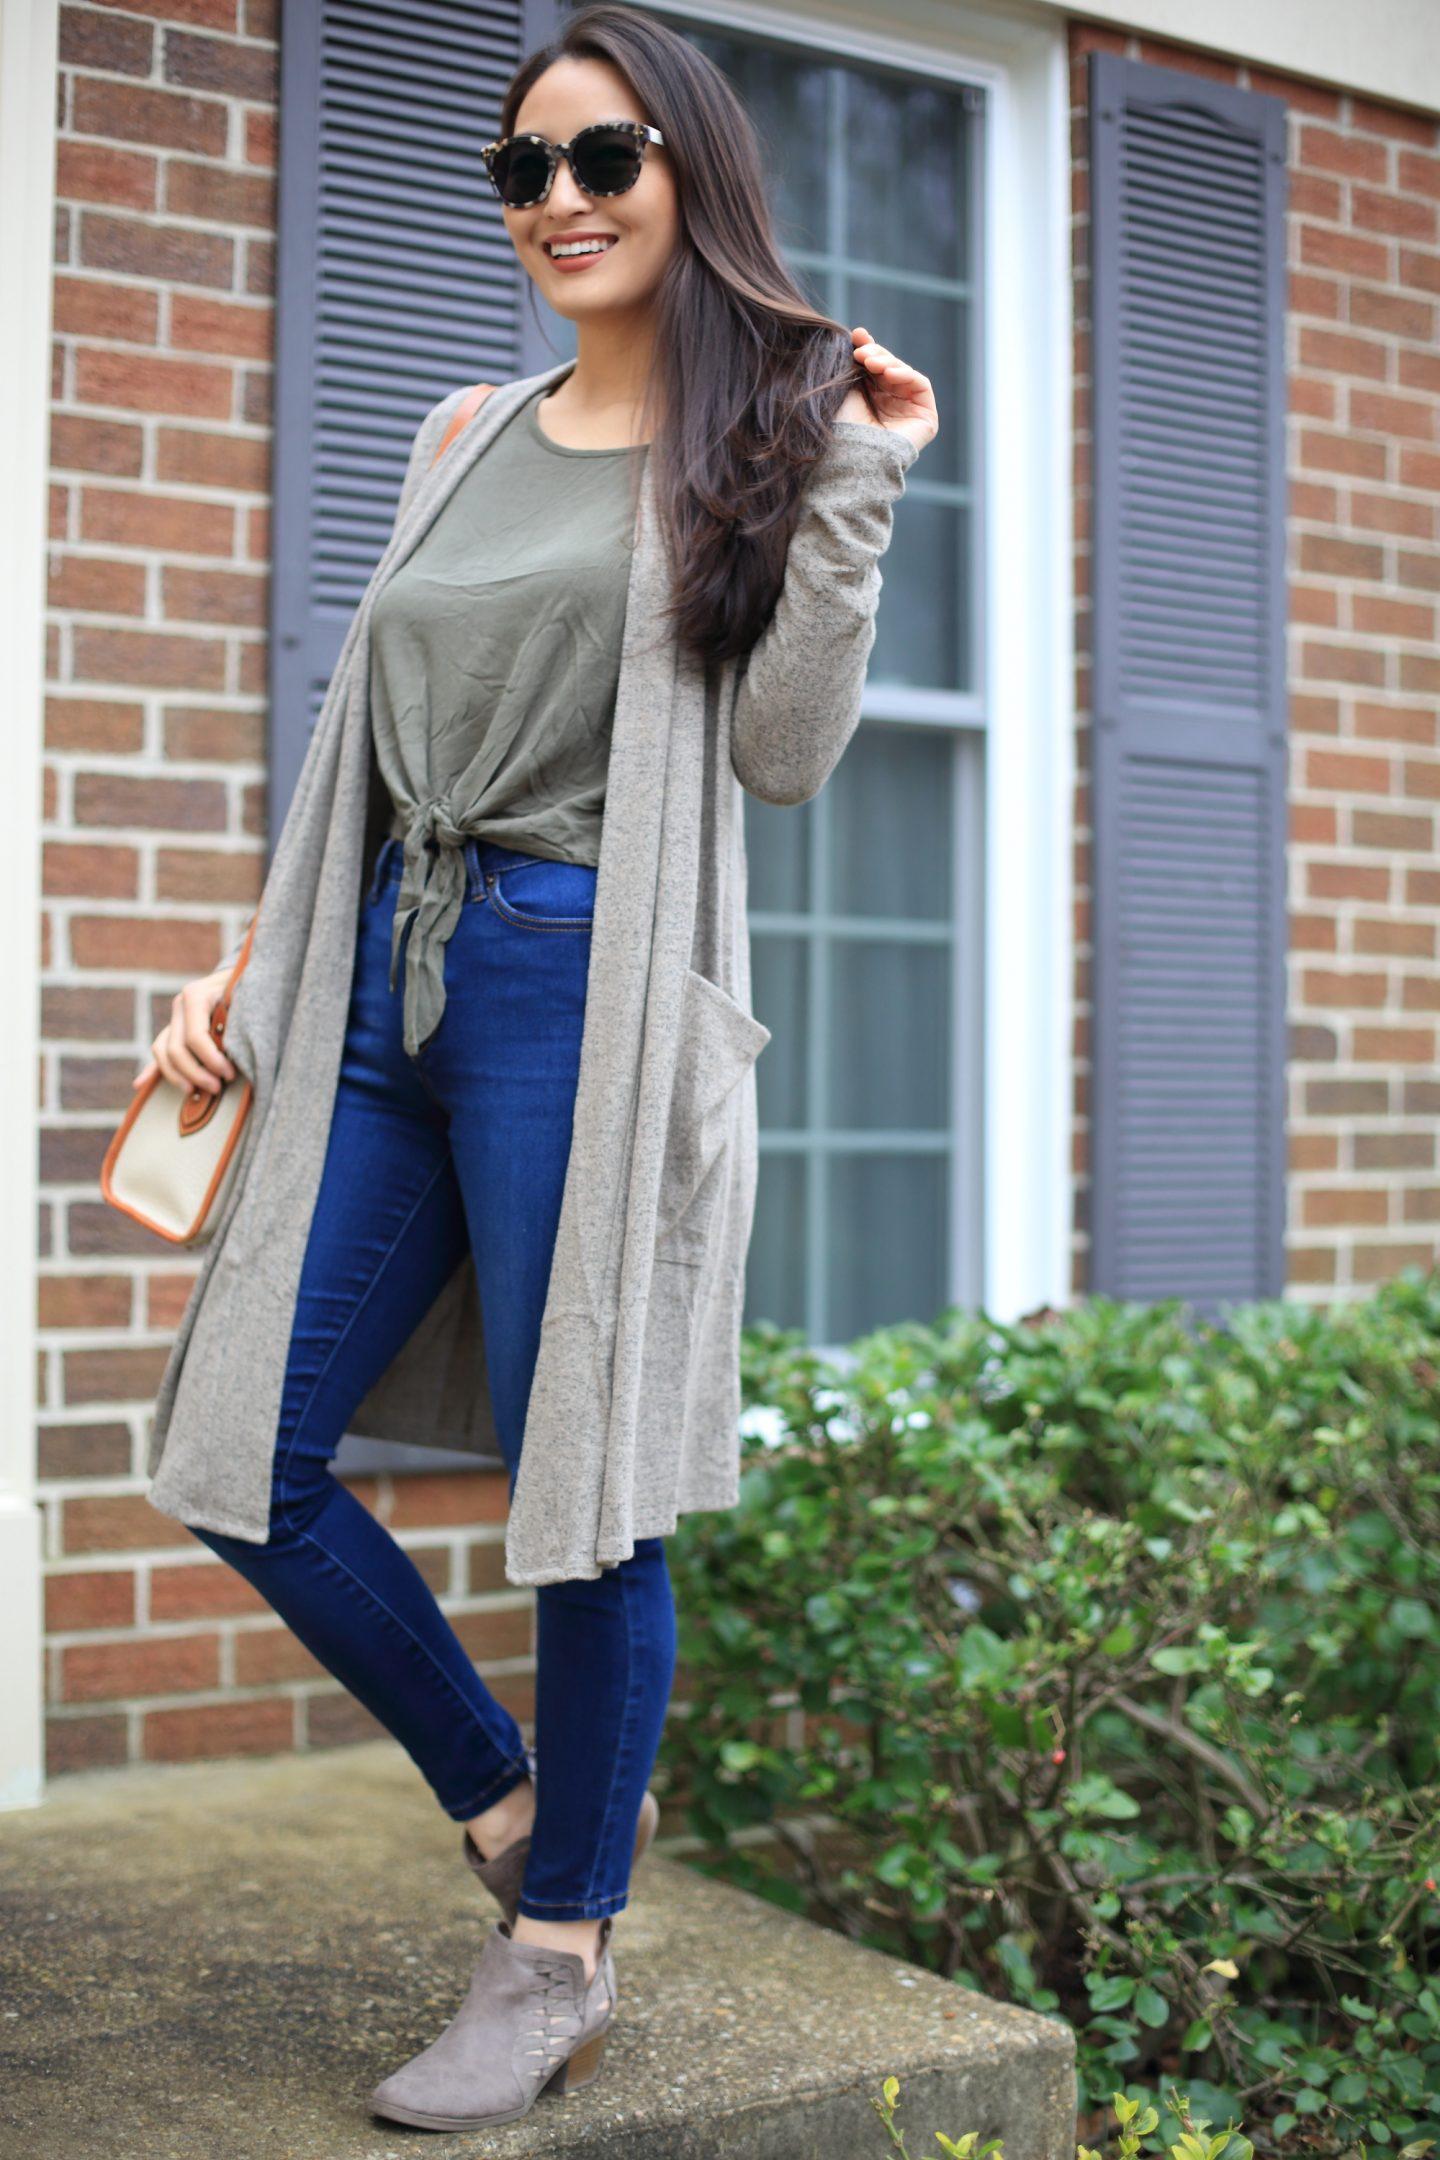 Moxie Apparel clothing